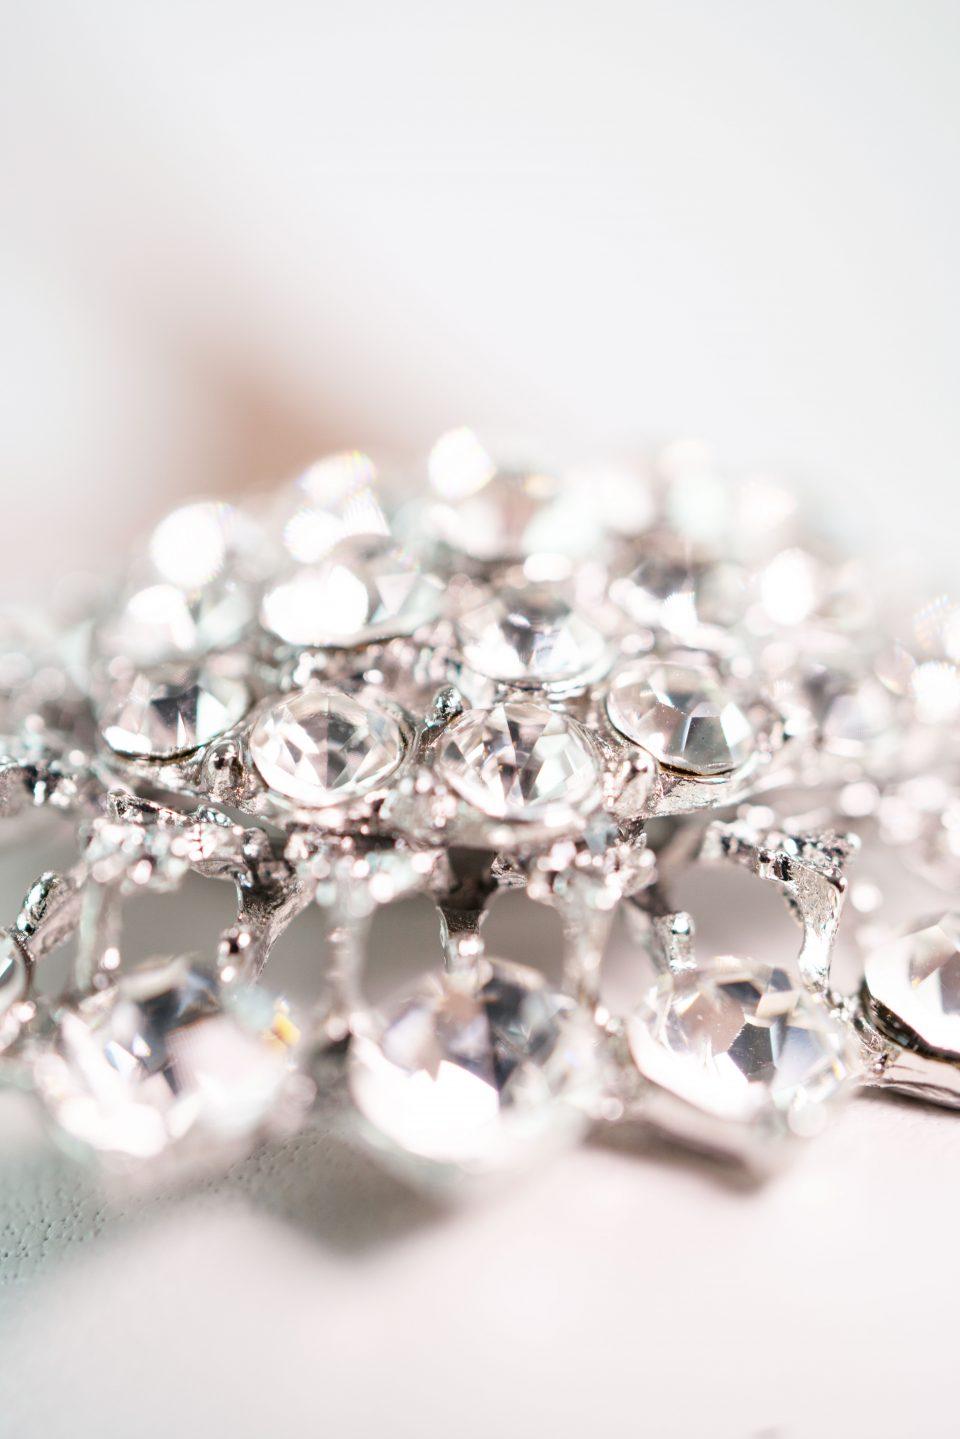 brautschuh schmuck brosche silber detail closeup